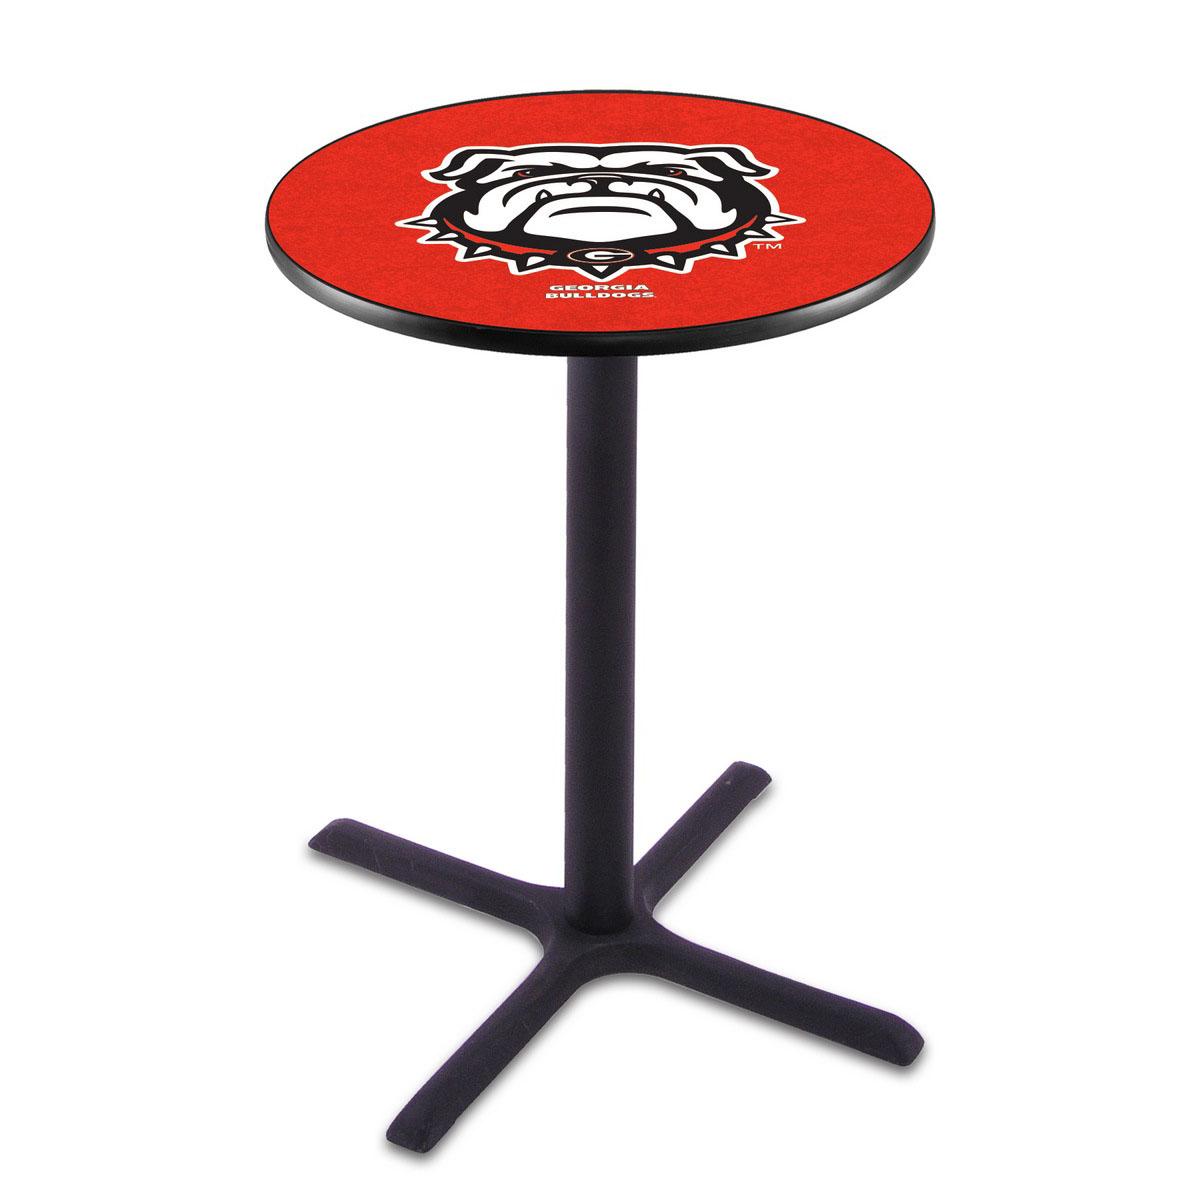 Information about Georgia Bulldog Wrinkle Pub Table Product Photo